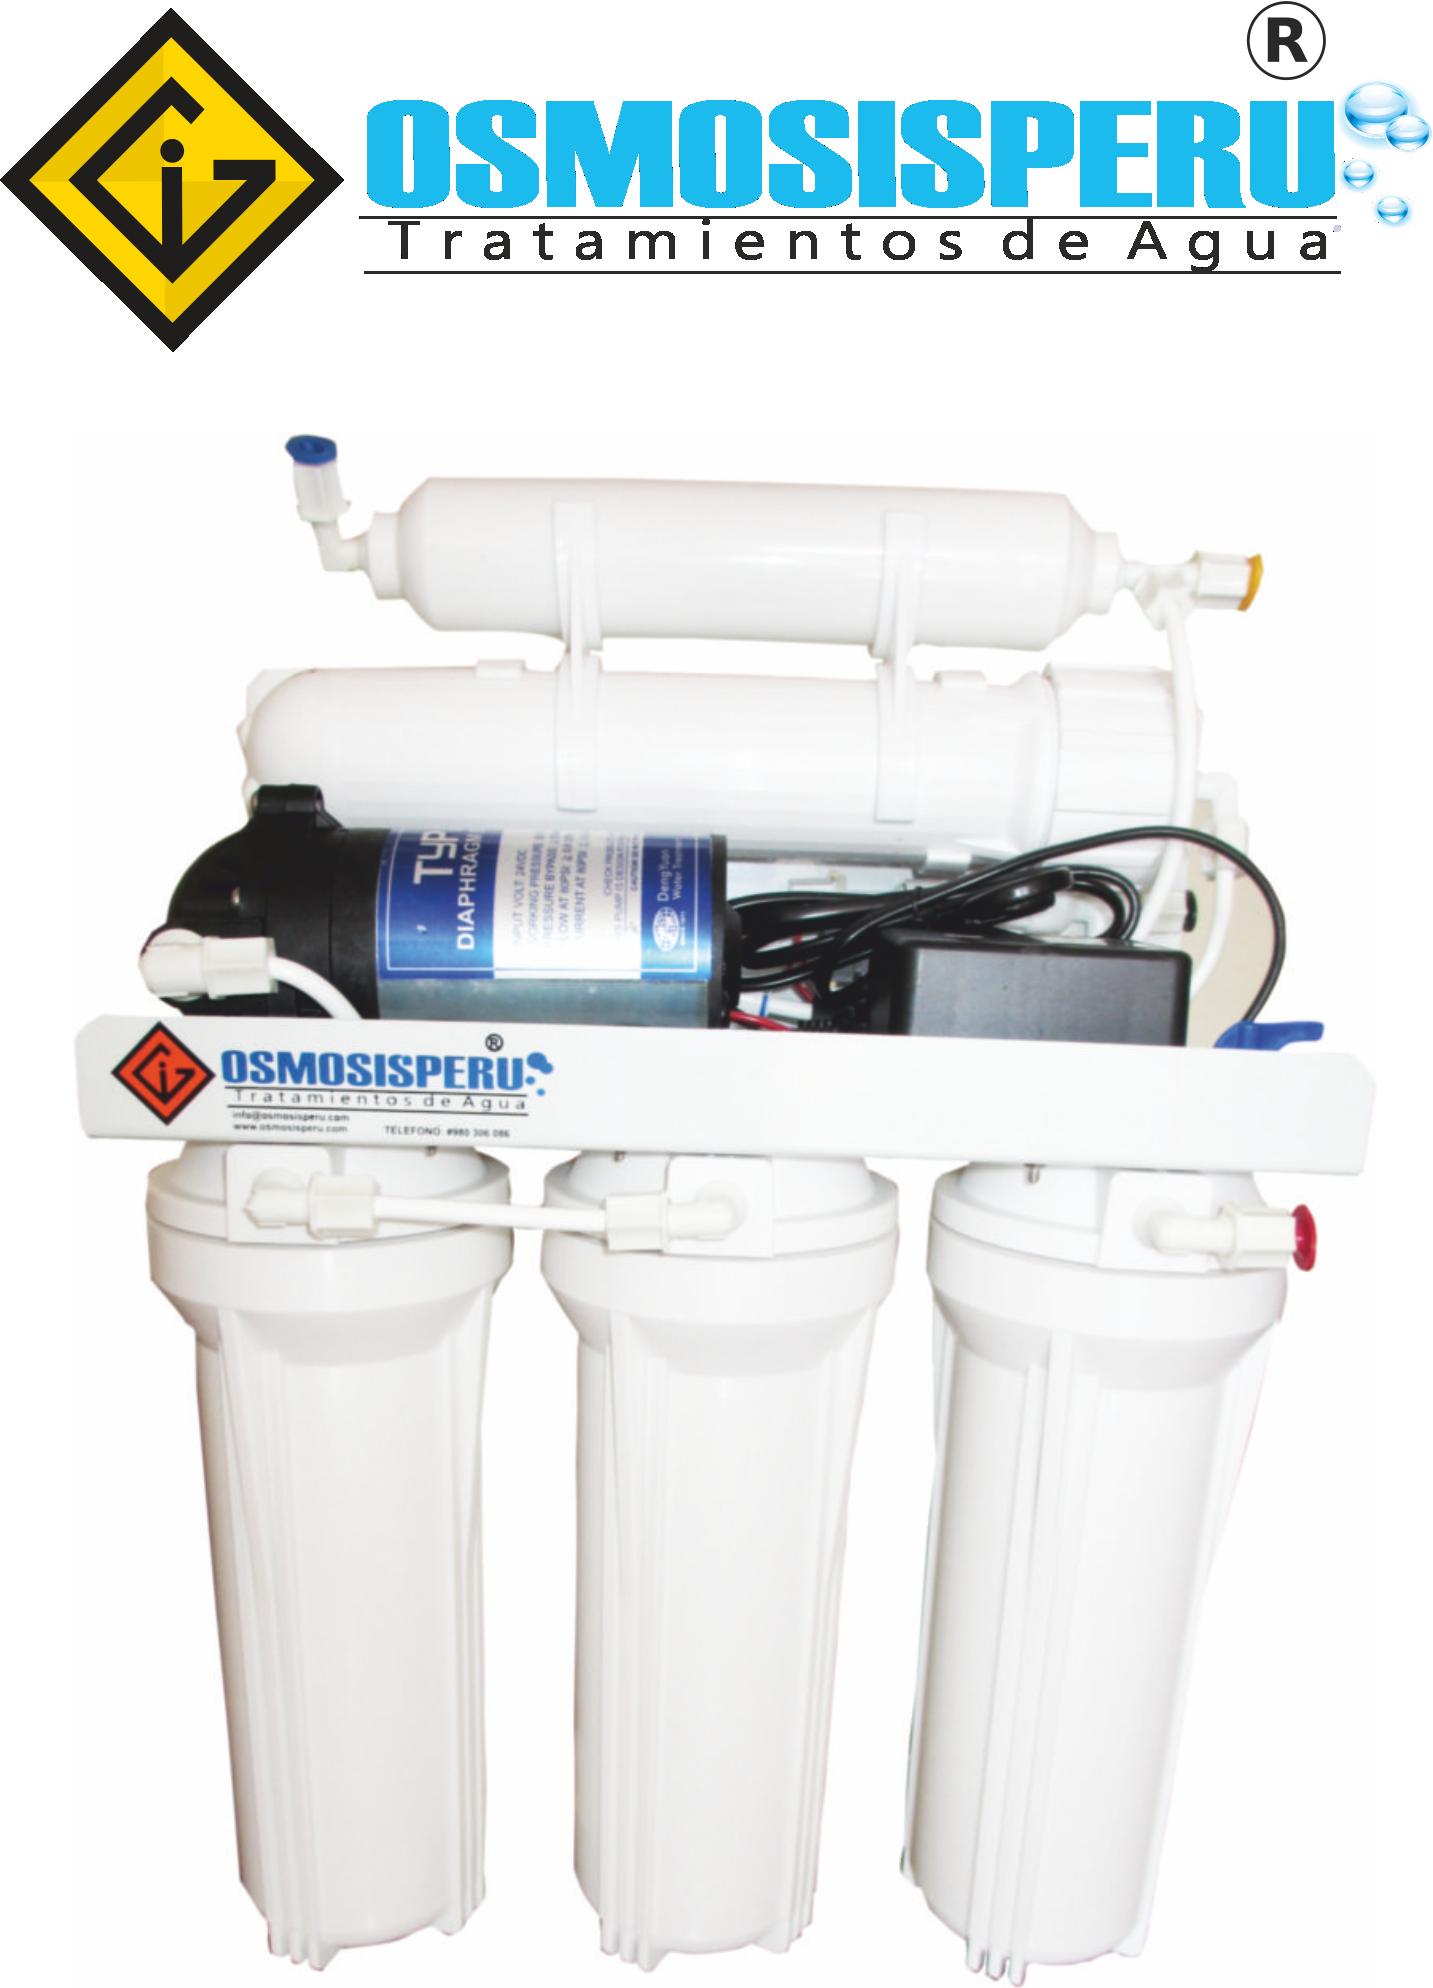 Agua Purificada ósmosis Inversa Alemaxx Com Agua Purificada Agua Purificadoras